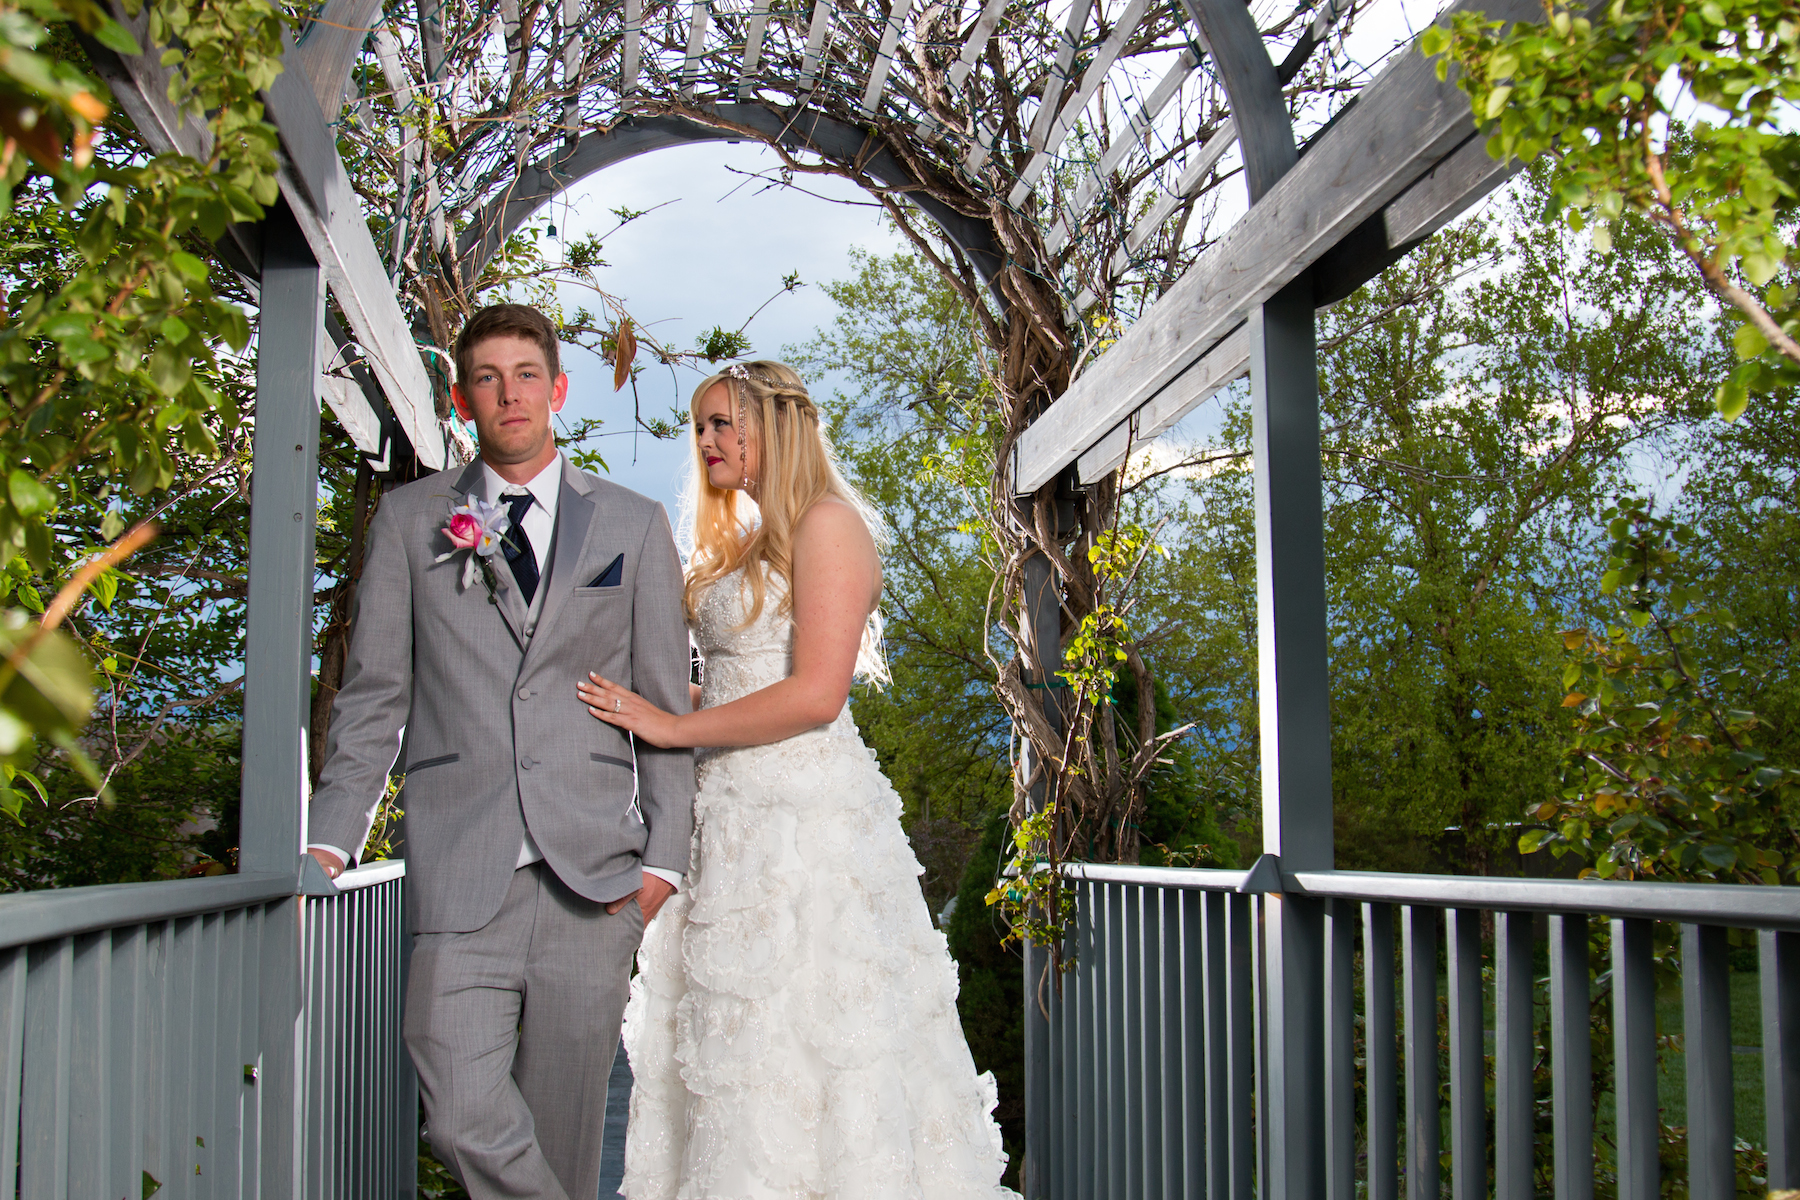 Milennial falls wedding photography sandy utah